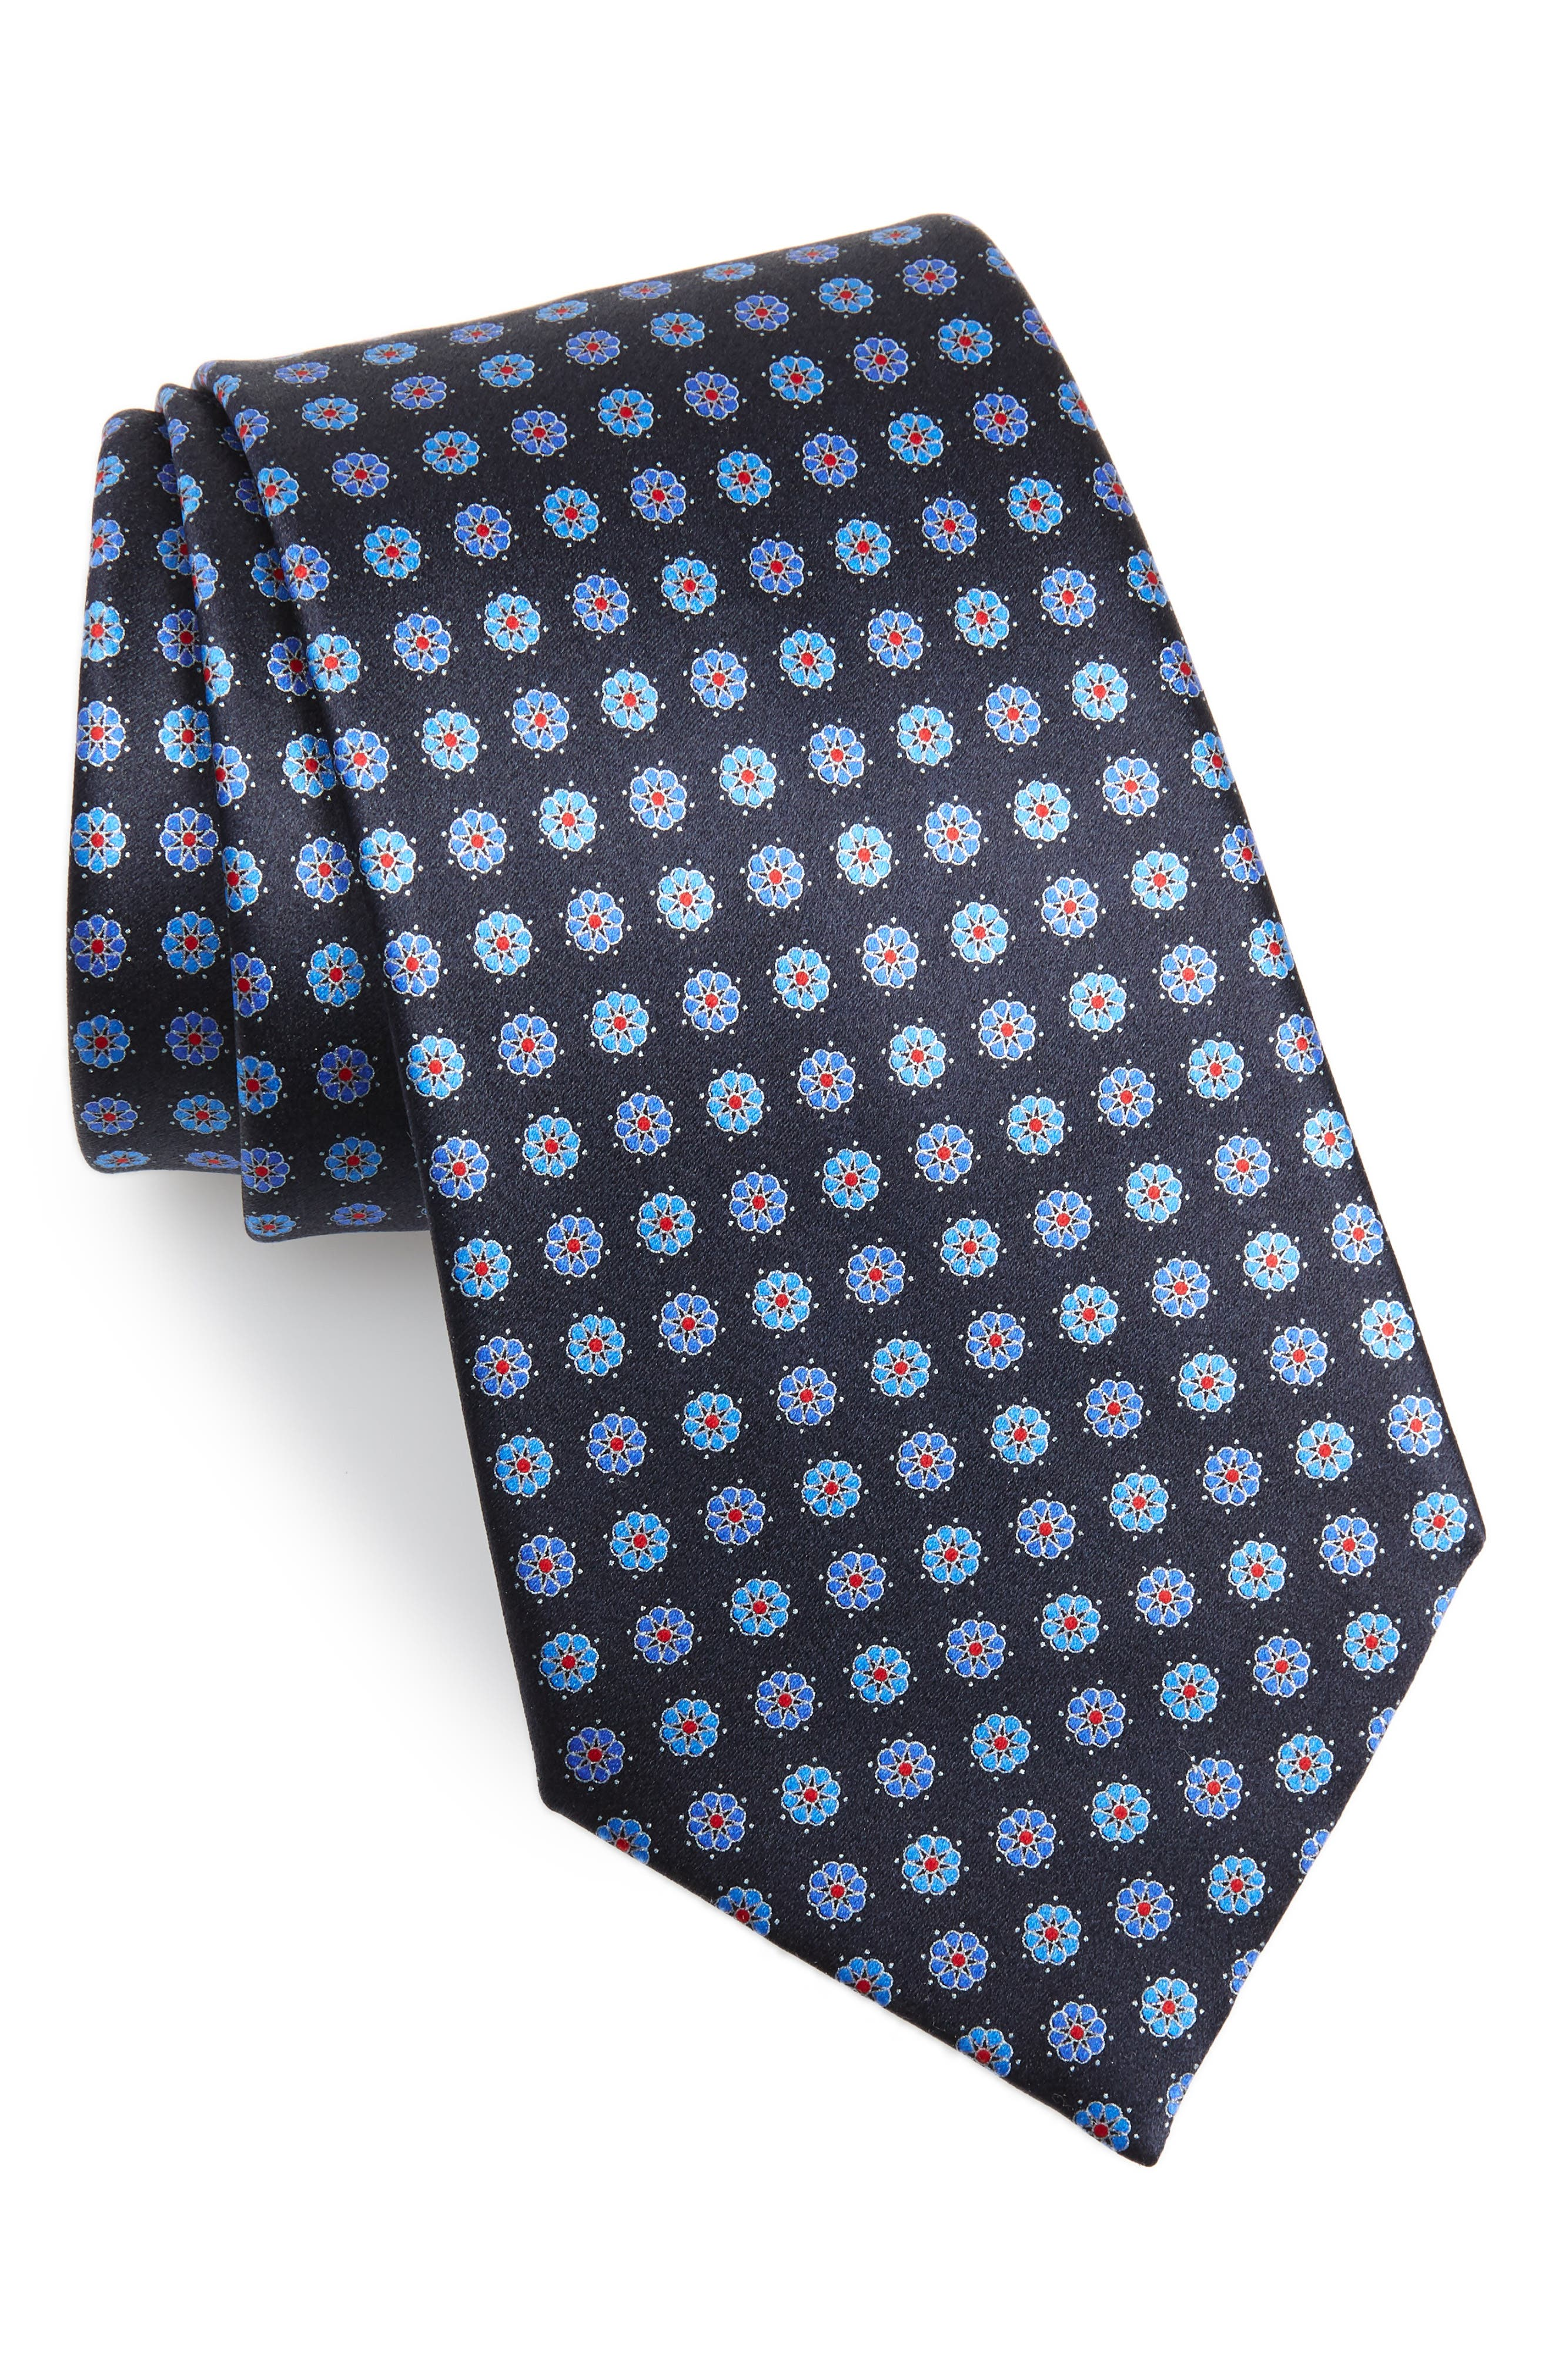 ERMENEGILDO ZEGNA, Floral Silk Tie, Main thumbnail 1, color, BLUE